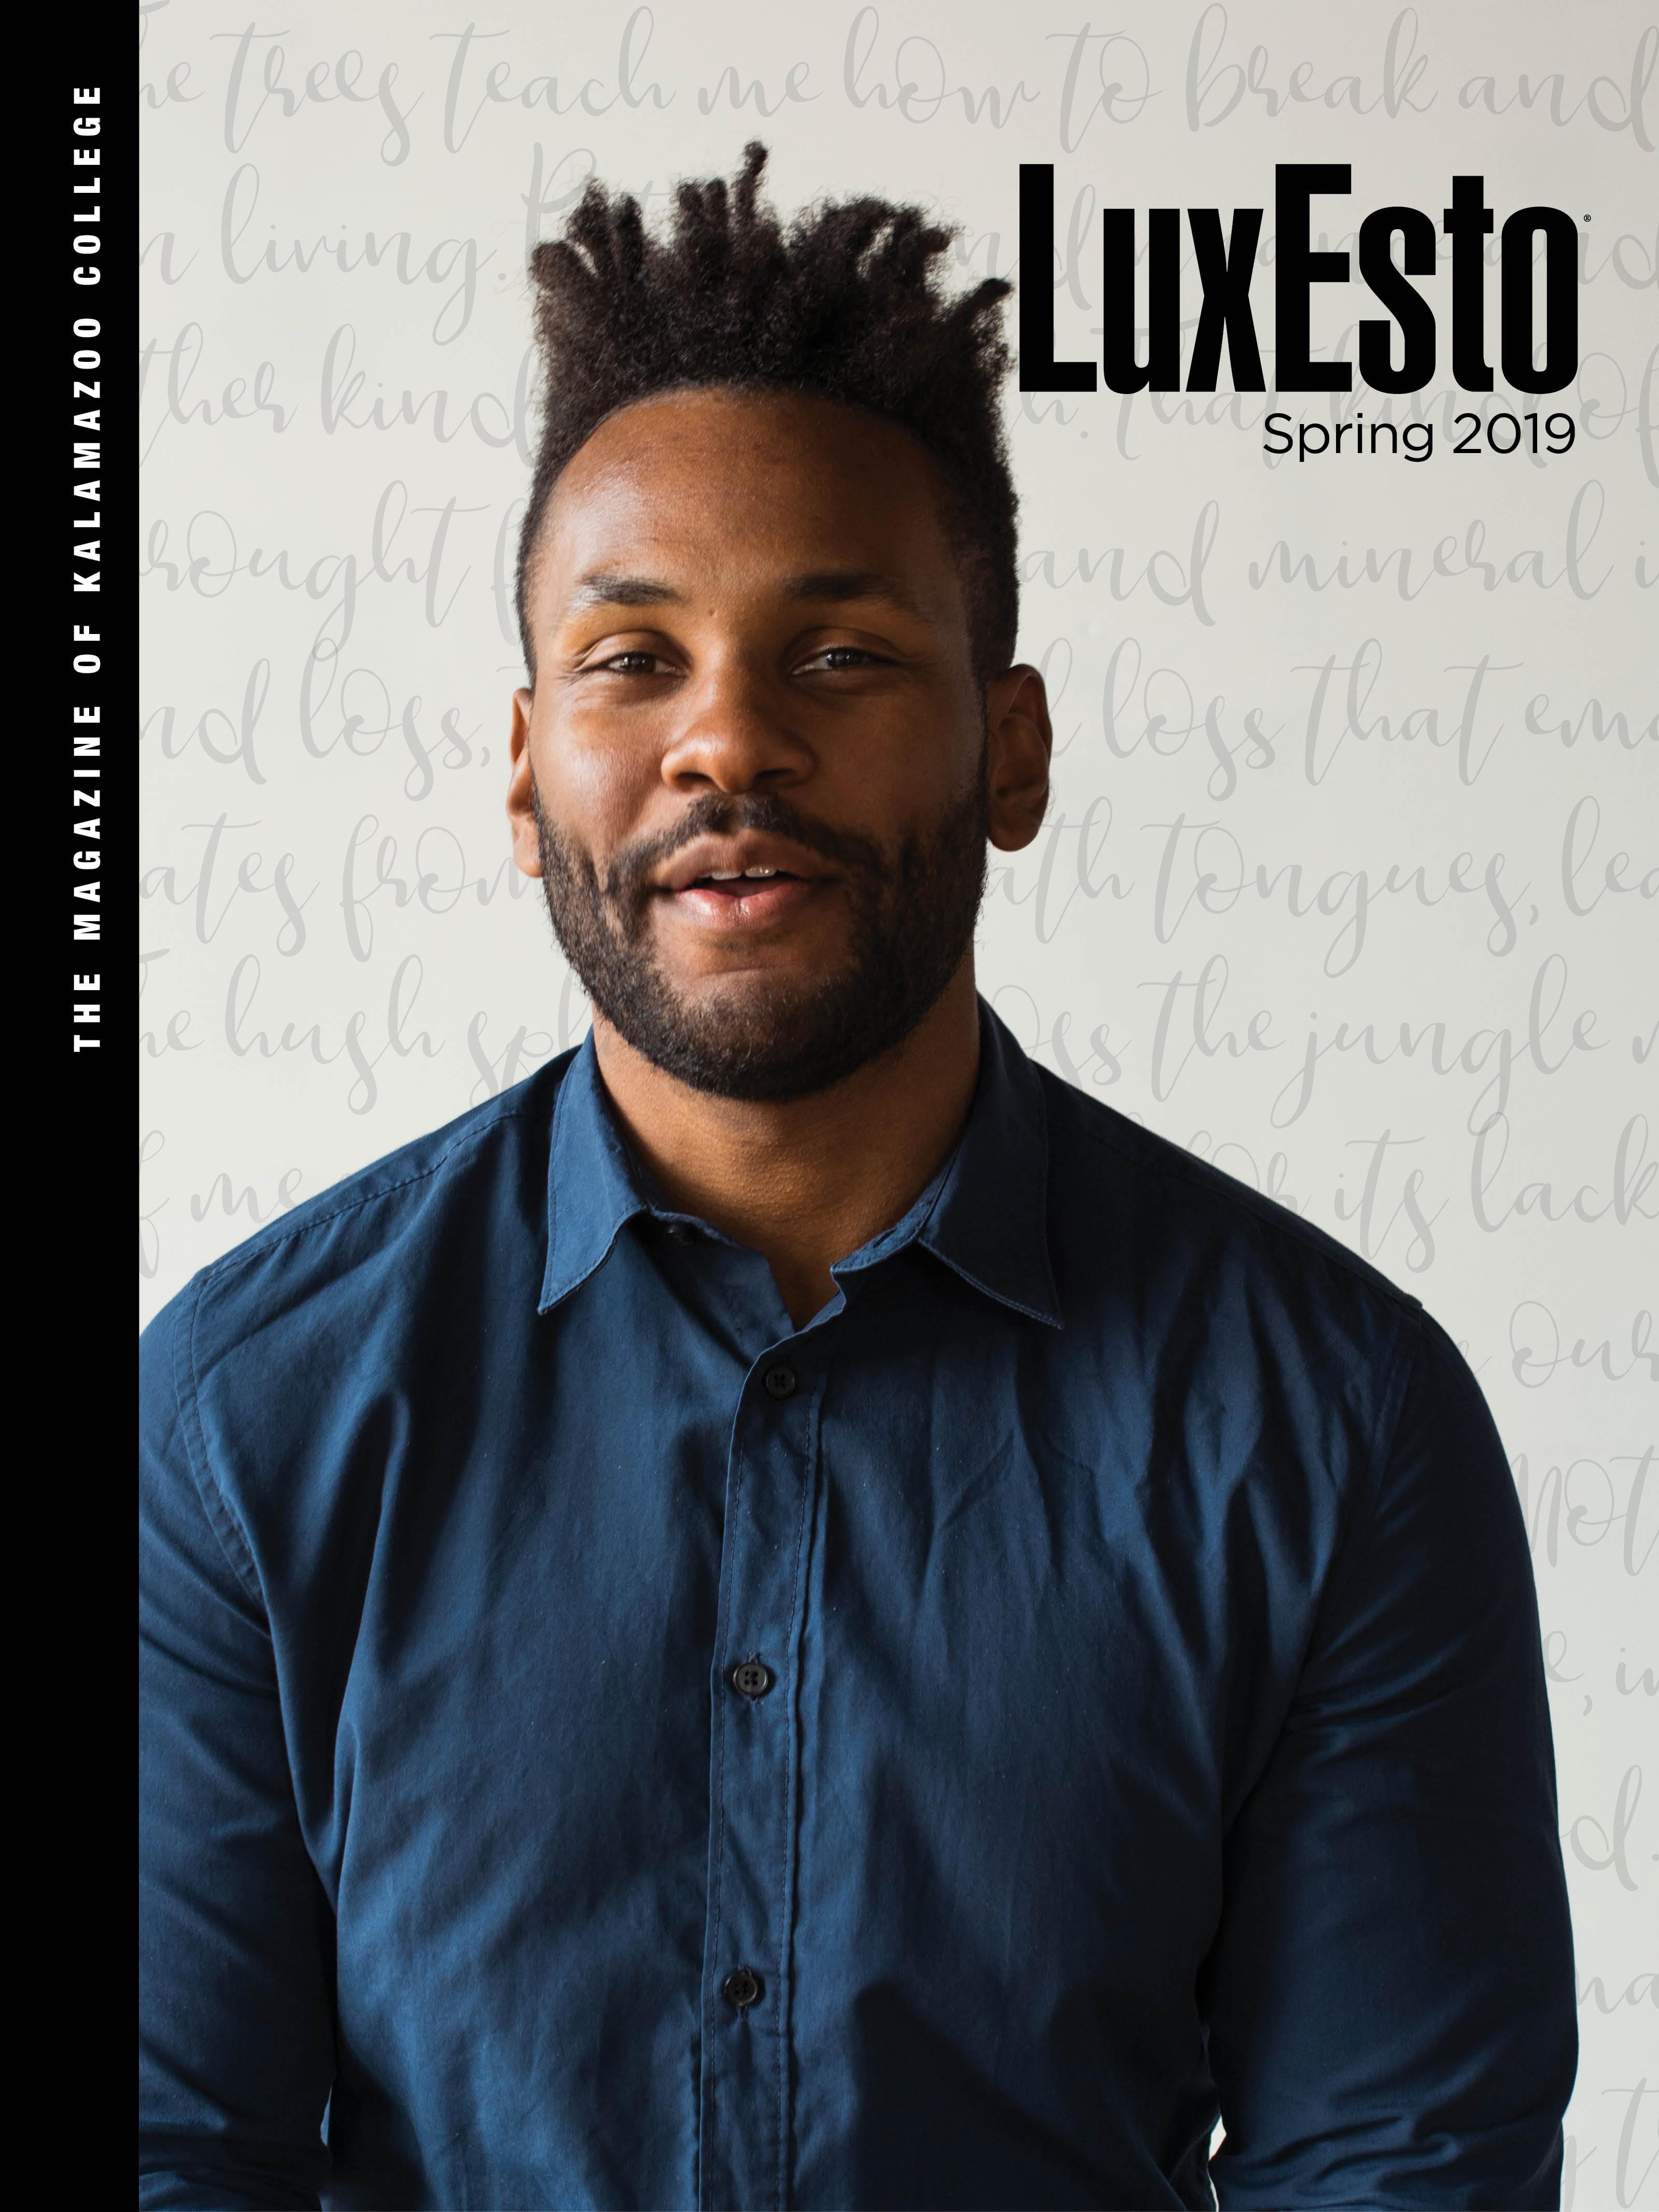 Spring 2019 LuxEsto Cover